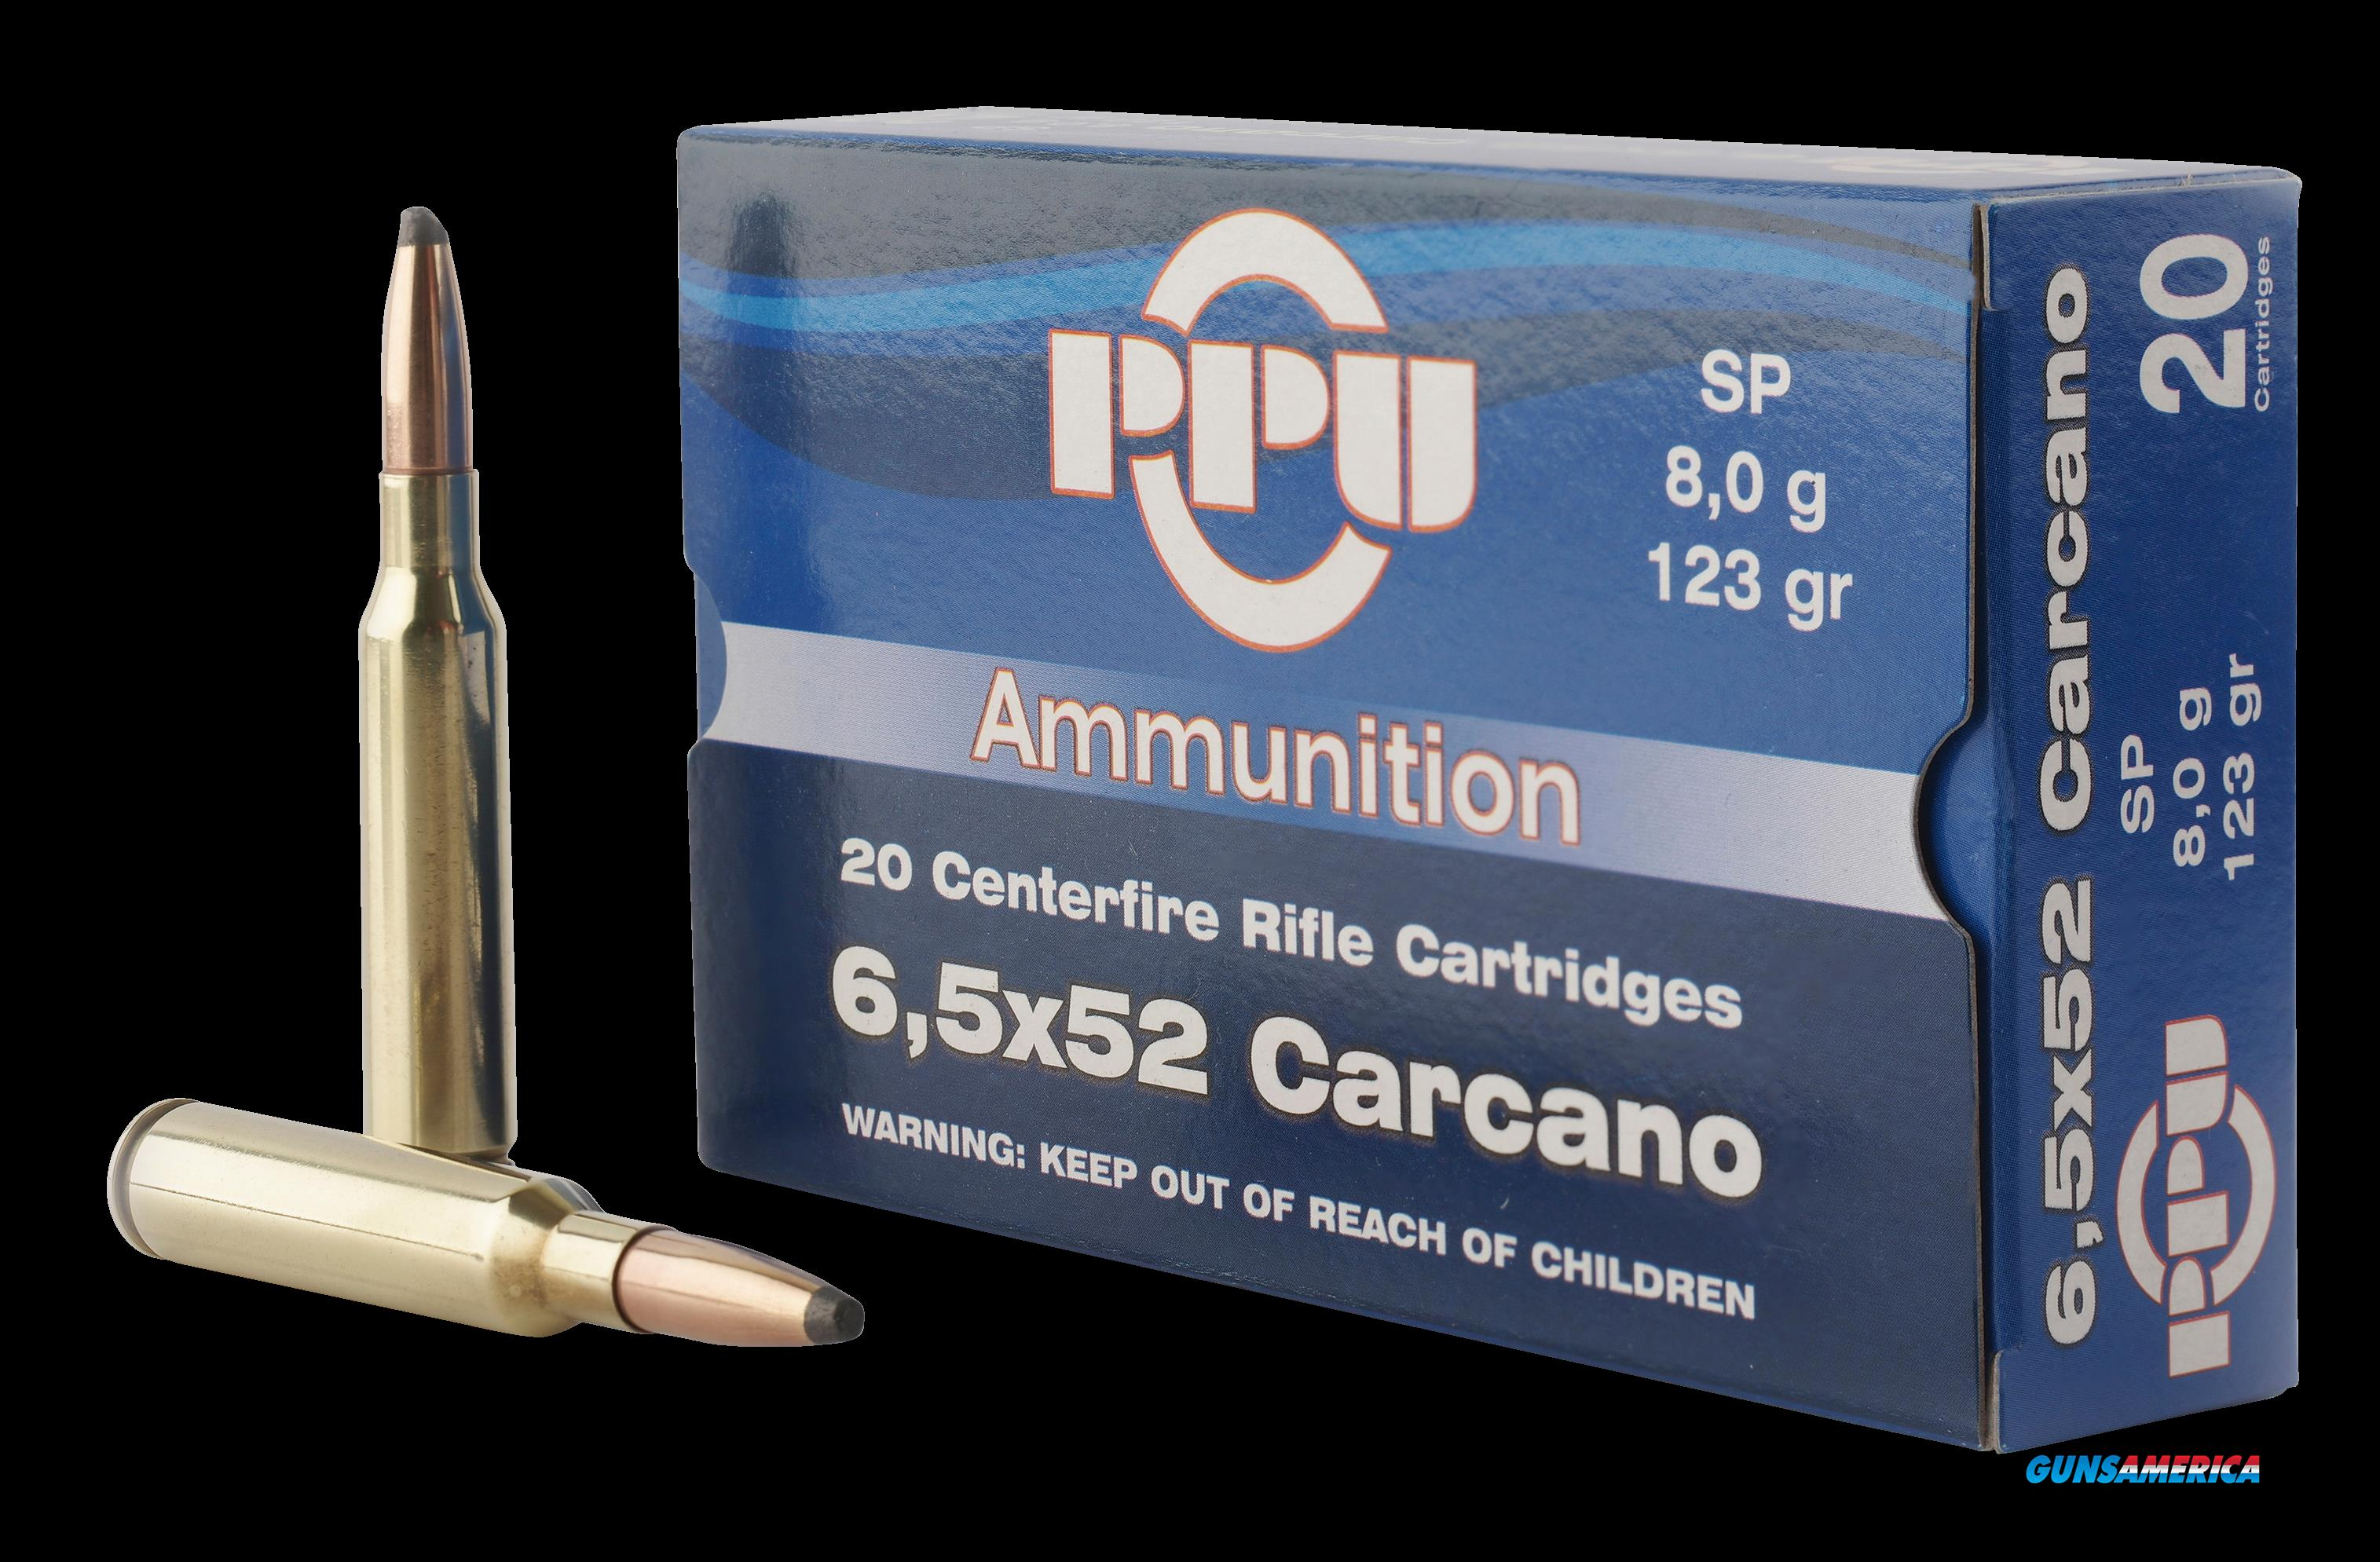 Ppu Metric Rifle, Ppu Pp6cs       6.5x52 Crcn 123 Sp           20-10  Guns > Pistols > 1911 Pistol Copies (non-Colt)